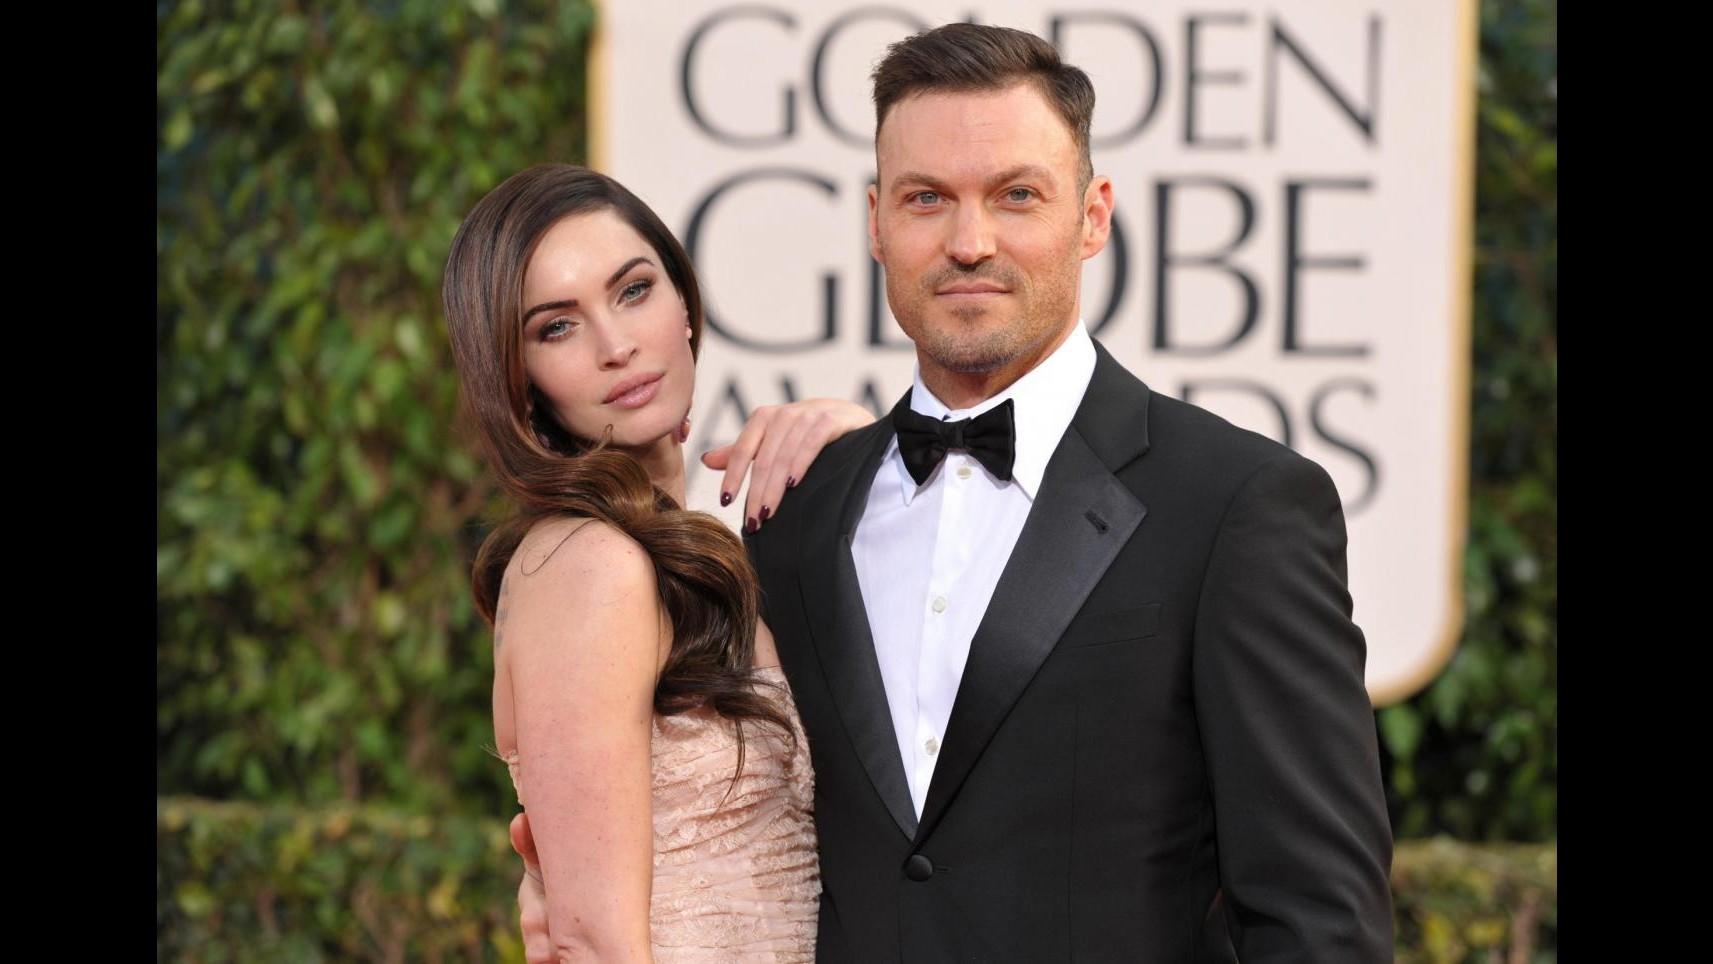 Megan Fox si scusa con Lindsay Lohan: Non volevo offenderla